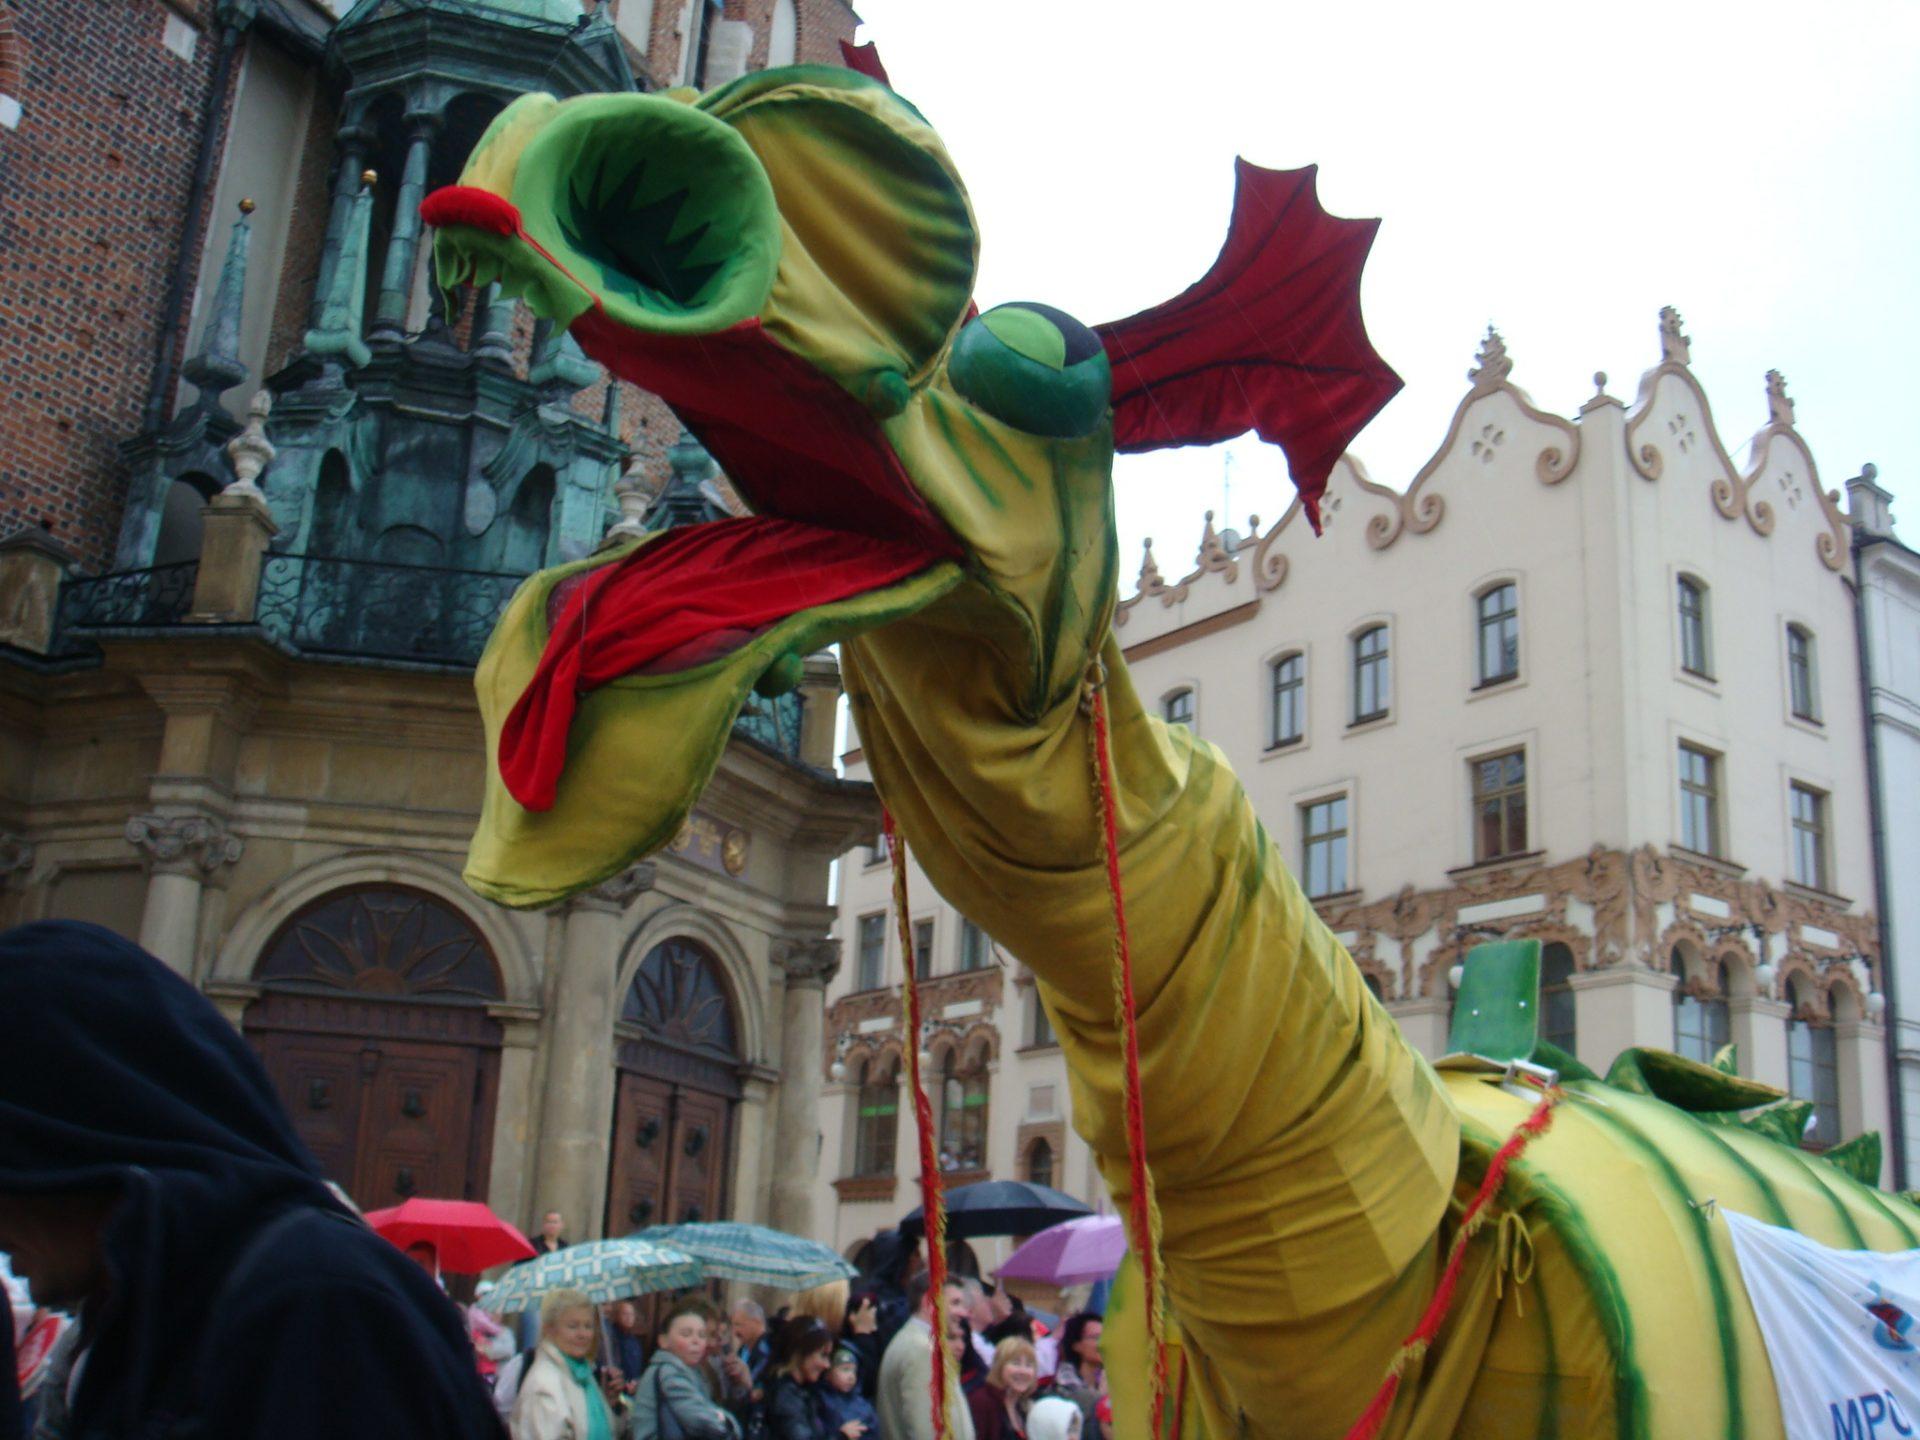 The present day Smok the Dragon